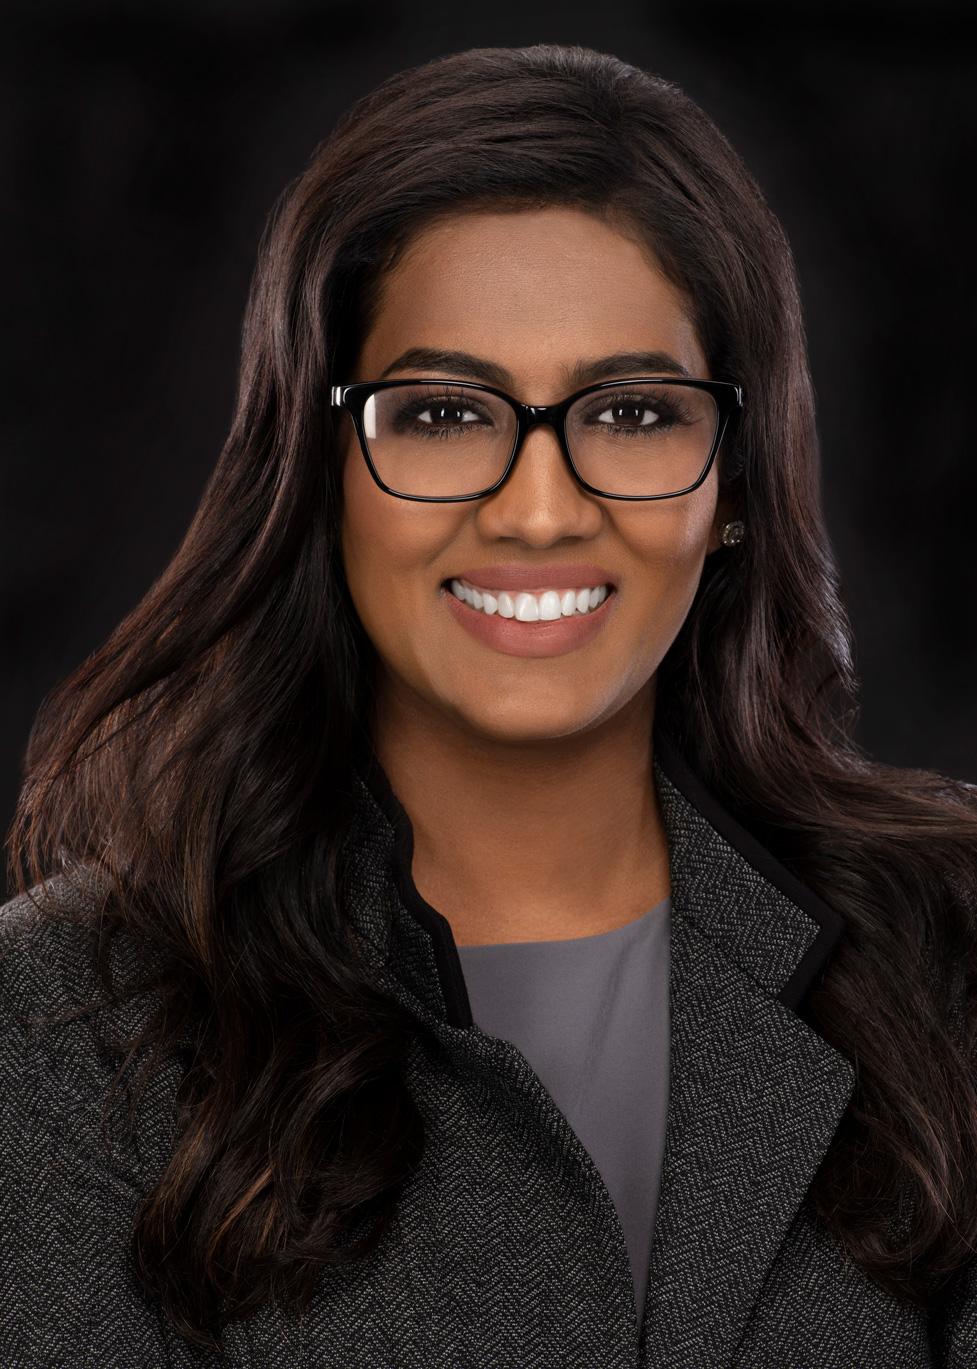 professional headshot of a business woman